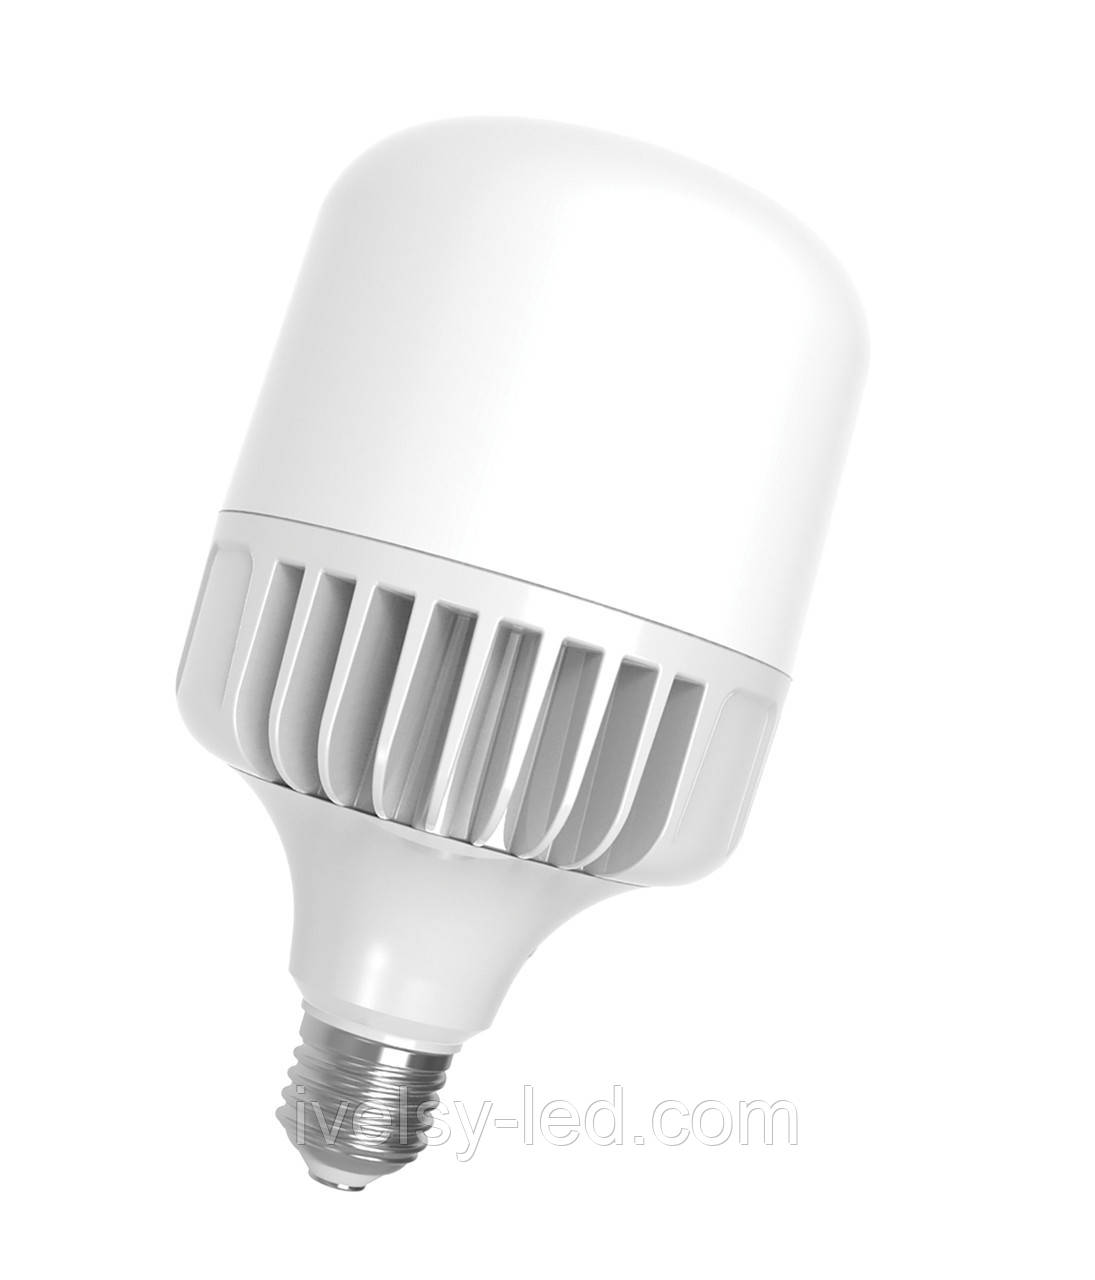 LED Лампа EUROLAMP высокомощная 30W E27 6500K